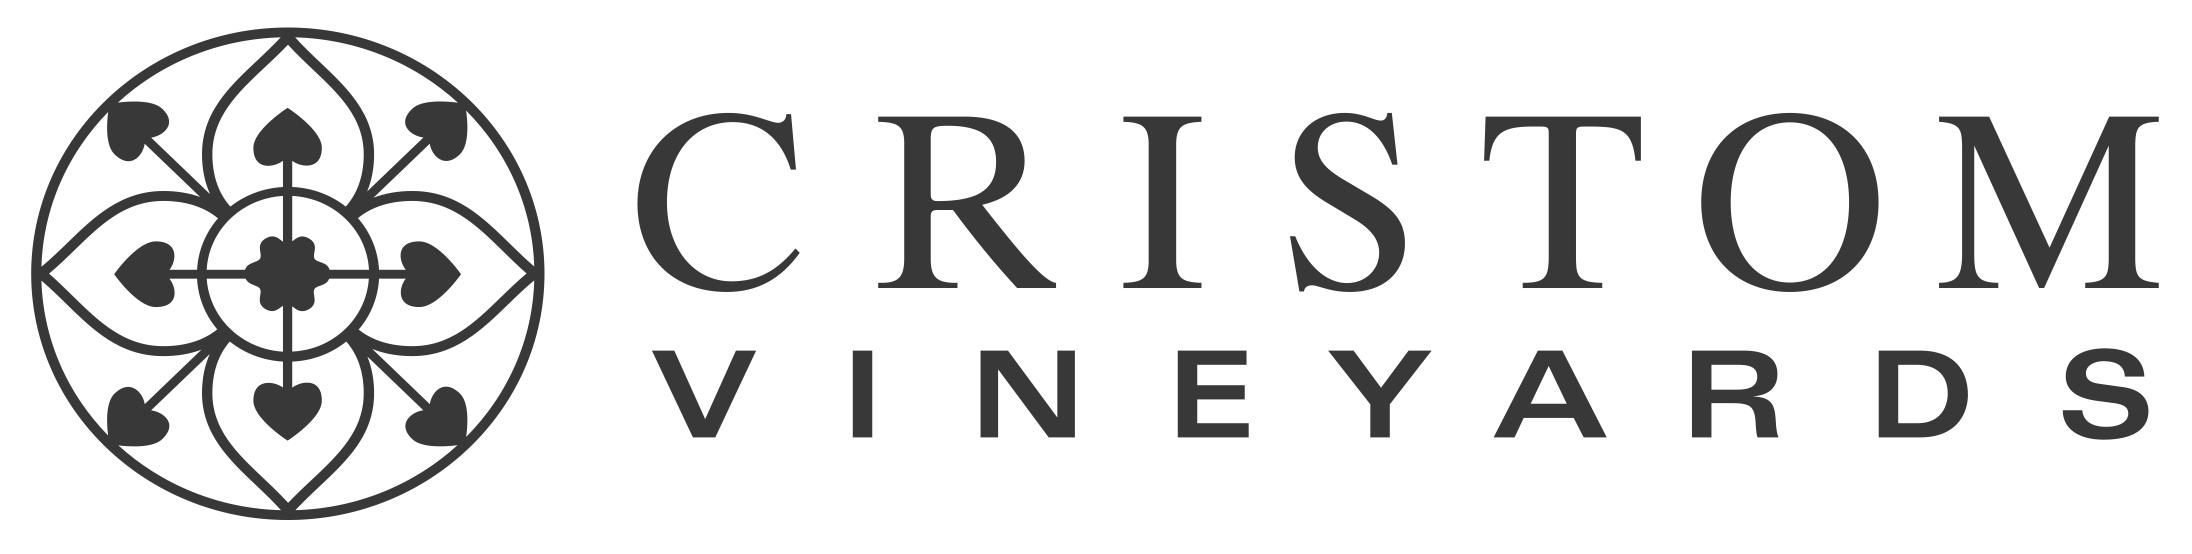 Cristom Logo horizontal.jpg